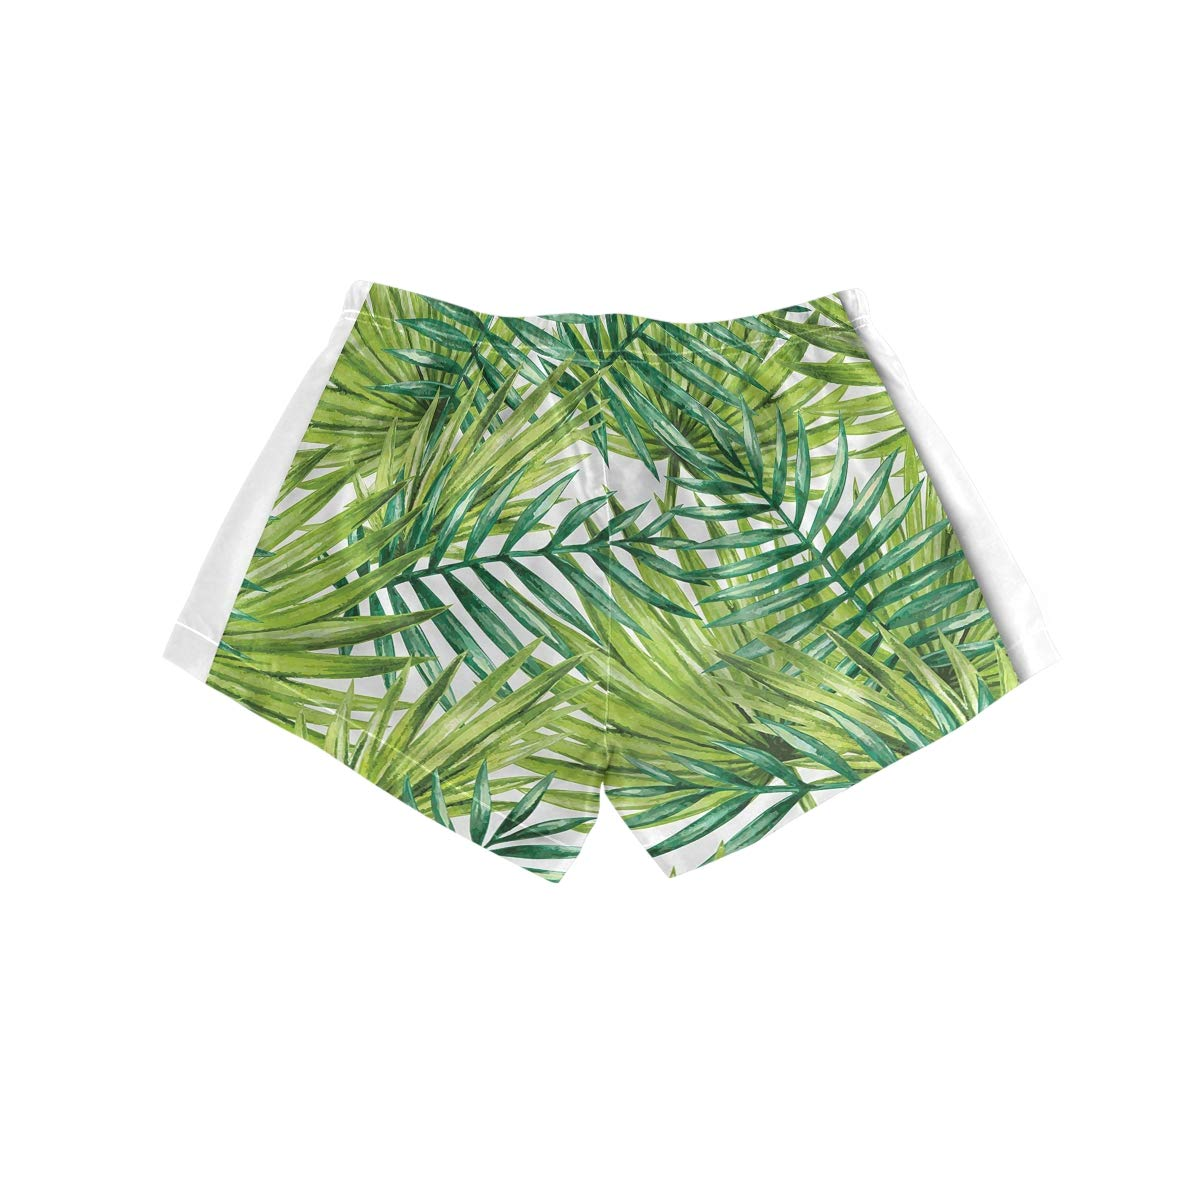 YOLOLIS Women Summer Boardshorts Quick Dry Swimwear Workout Shorts Printed Tropical Palm Leaves